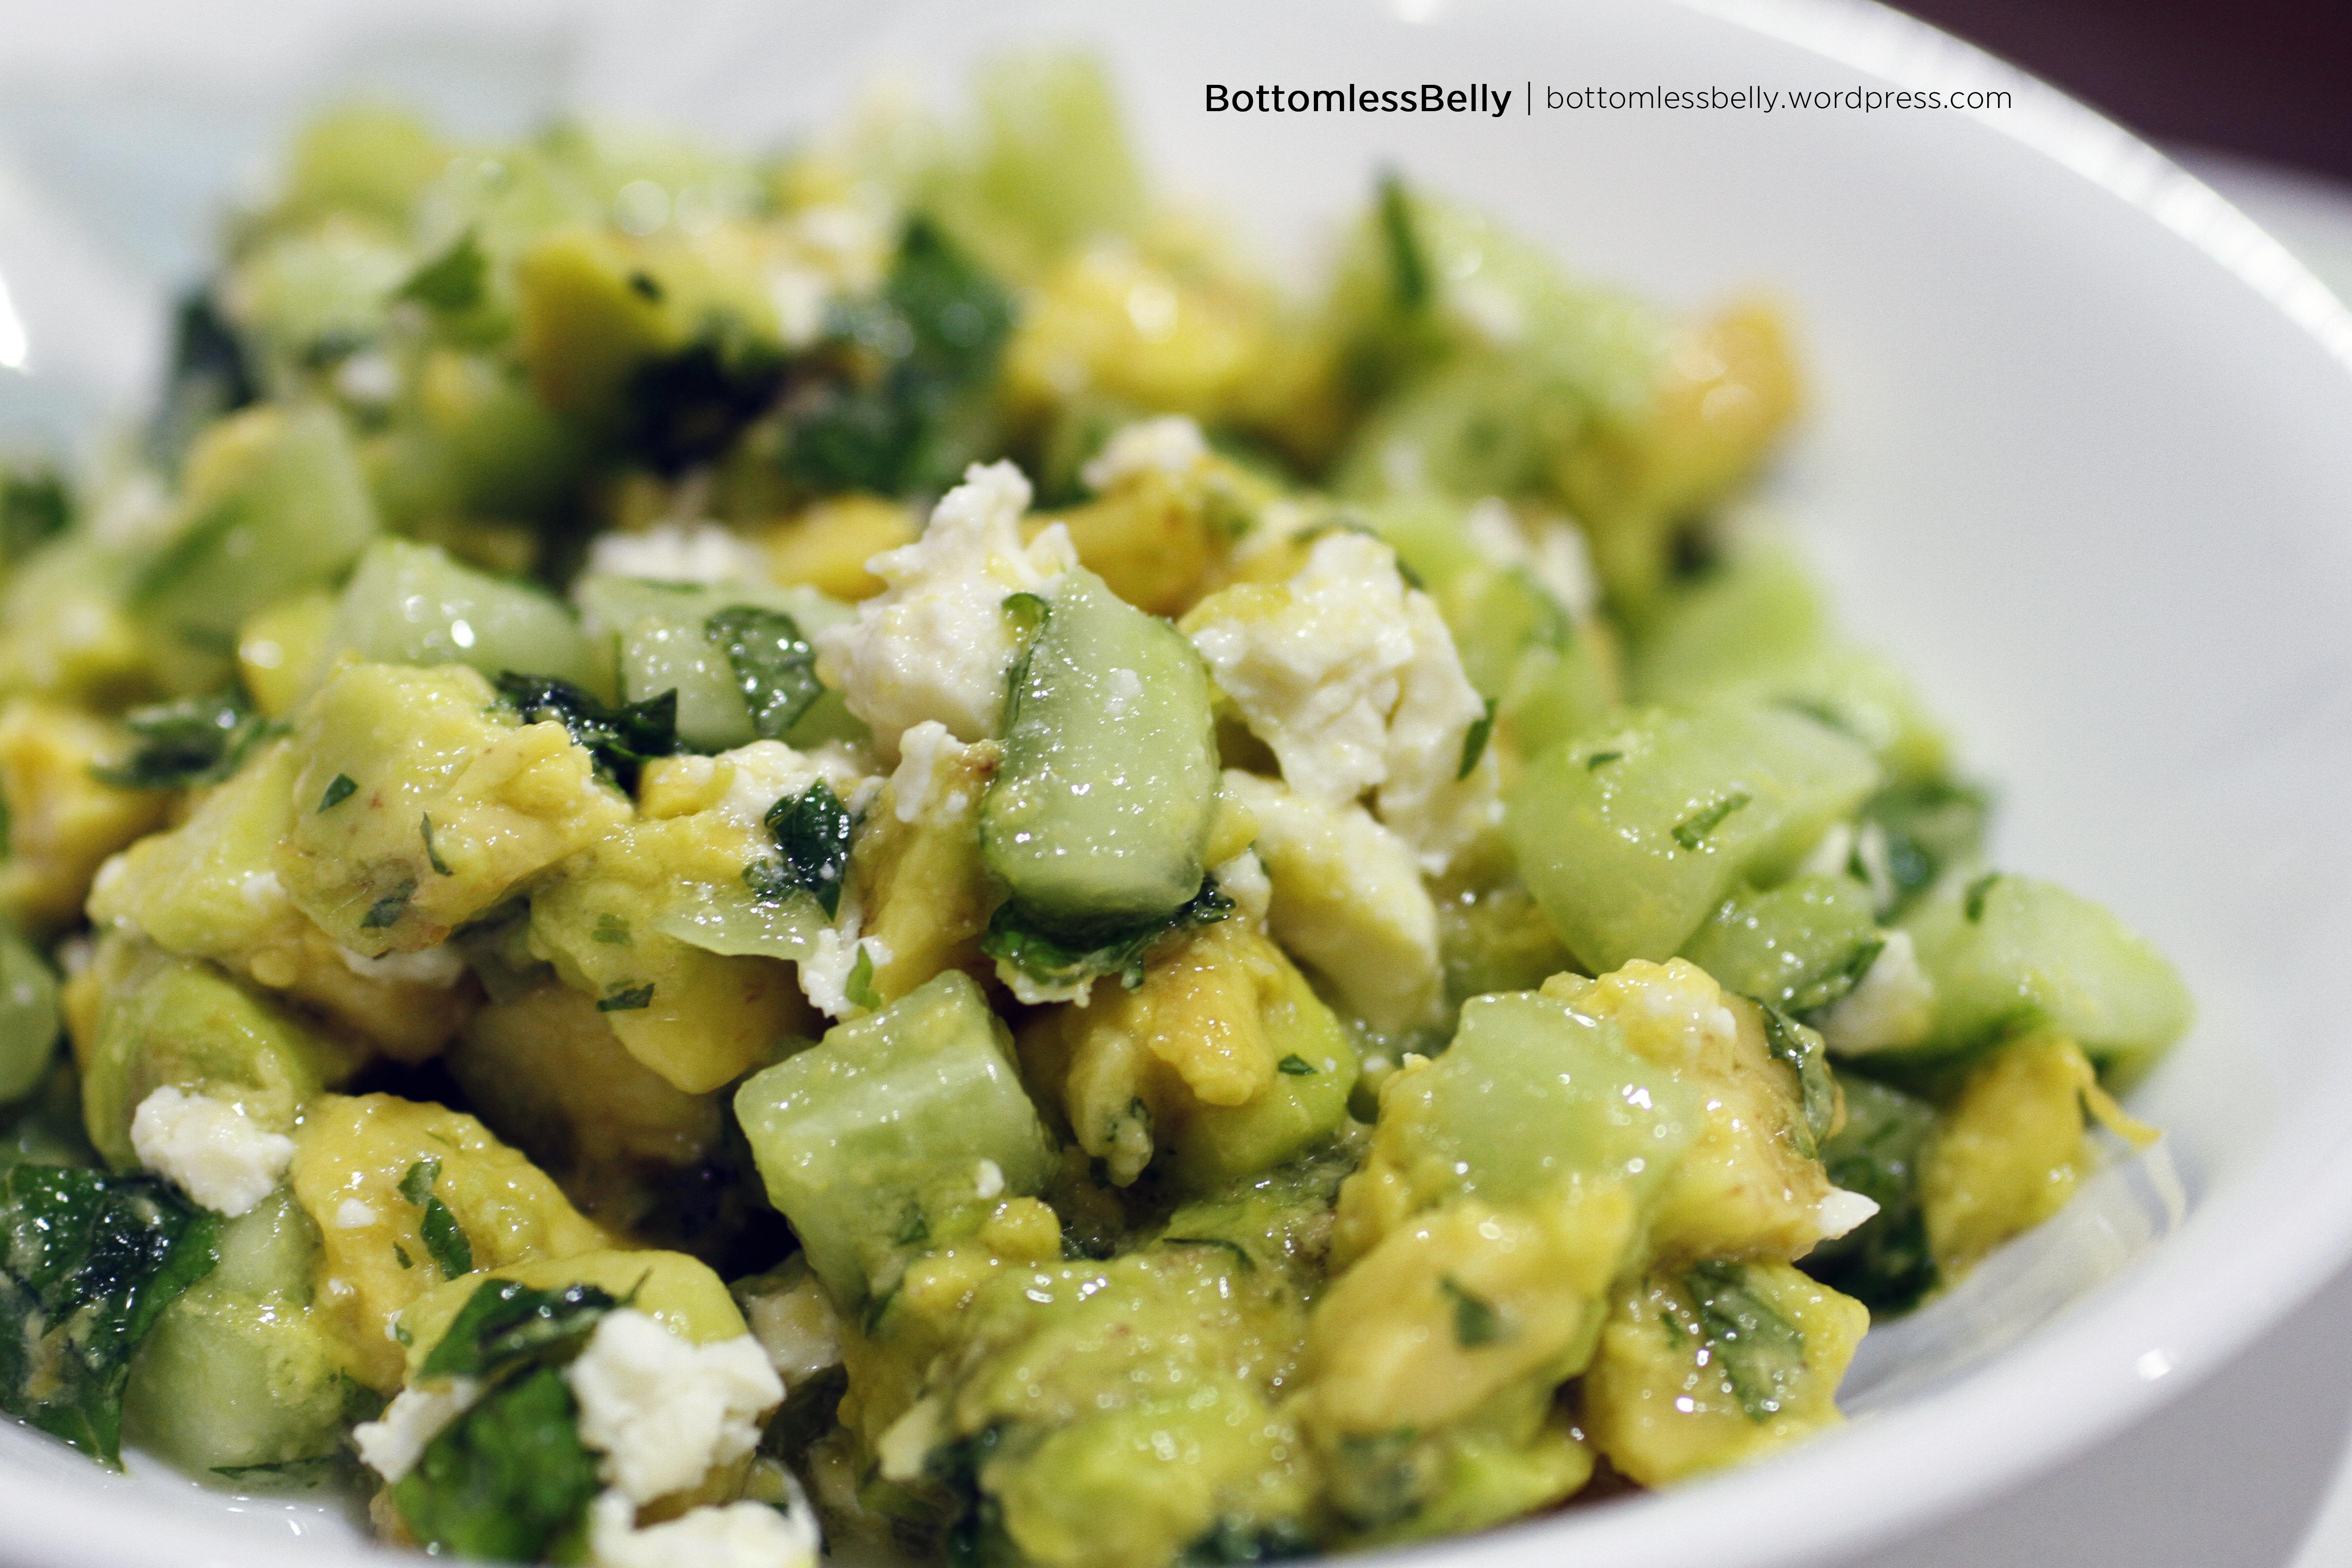 Cucumber Avocado Salad with Lemon, Mint, and Feta | FoodEase